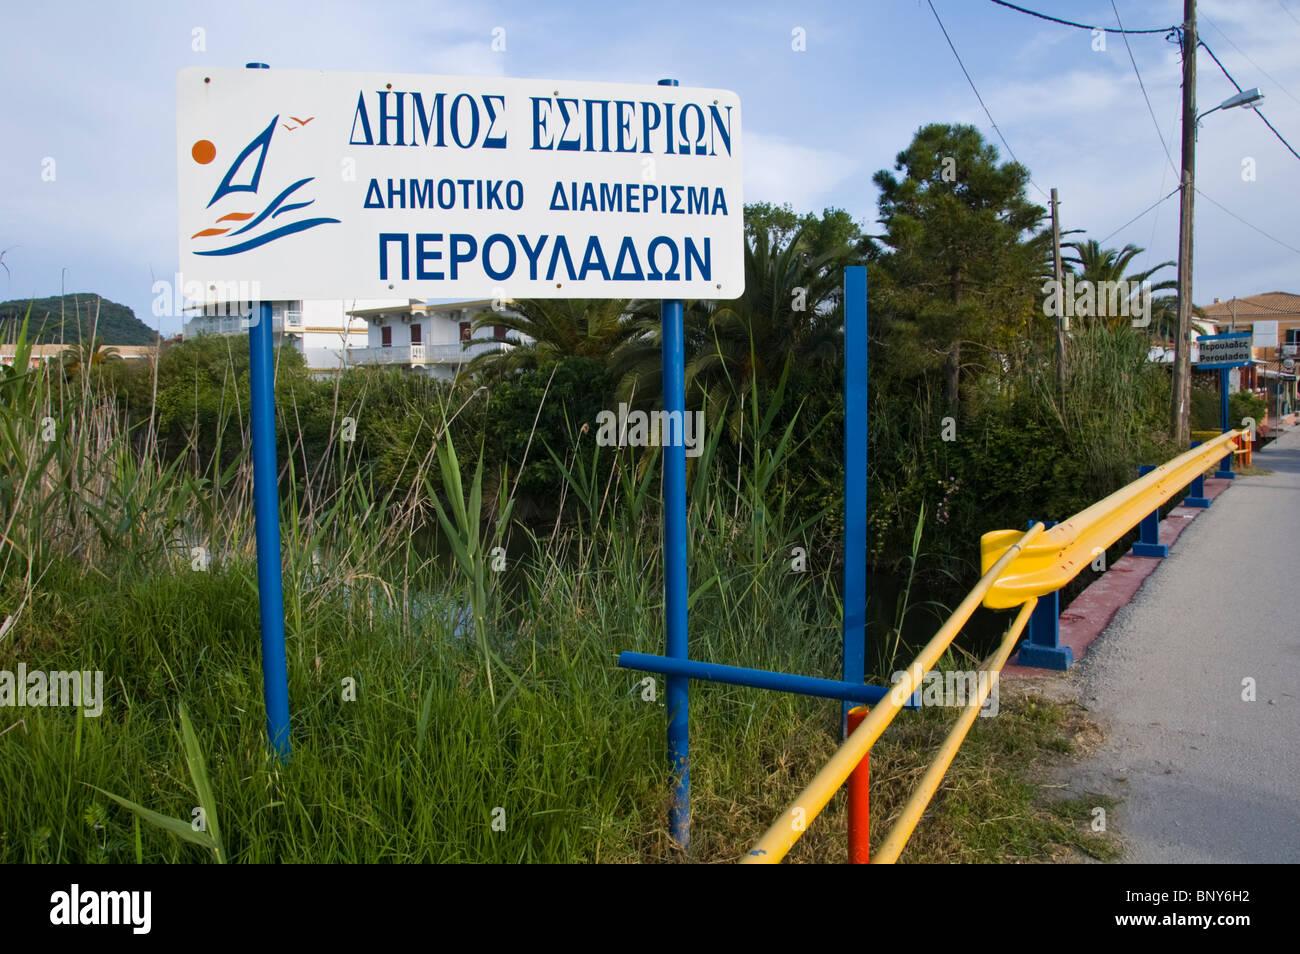 Roadside Greek language sign at Sidari on the Greek island of Corfu Greece GR - Stock Image